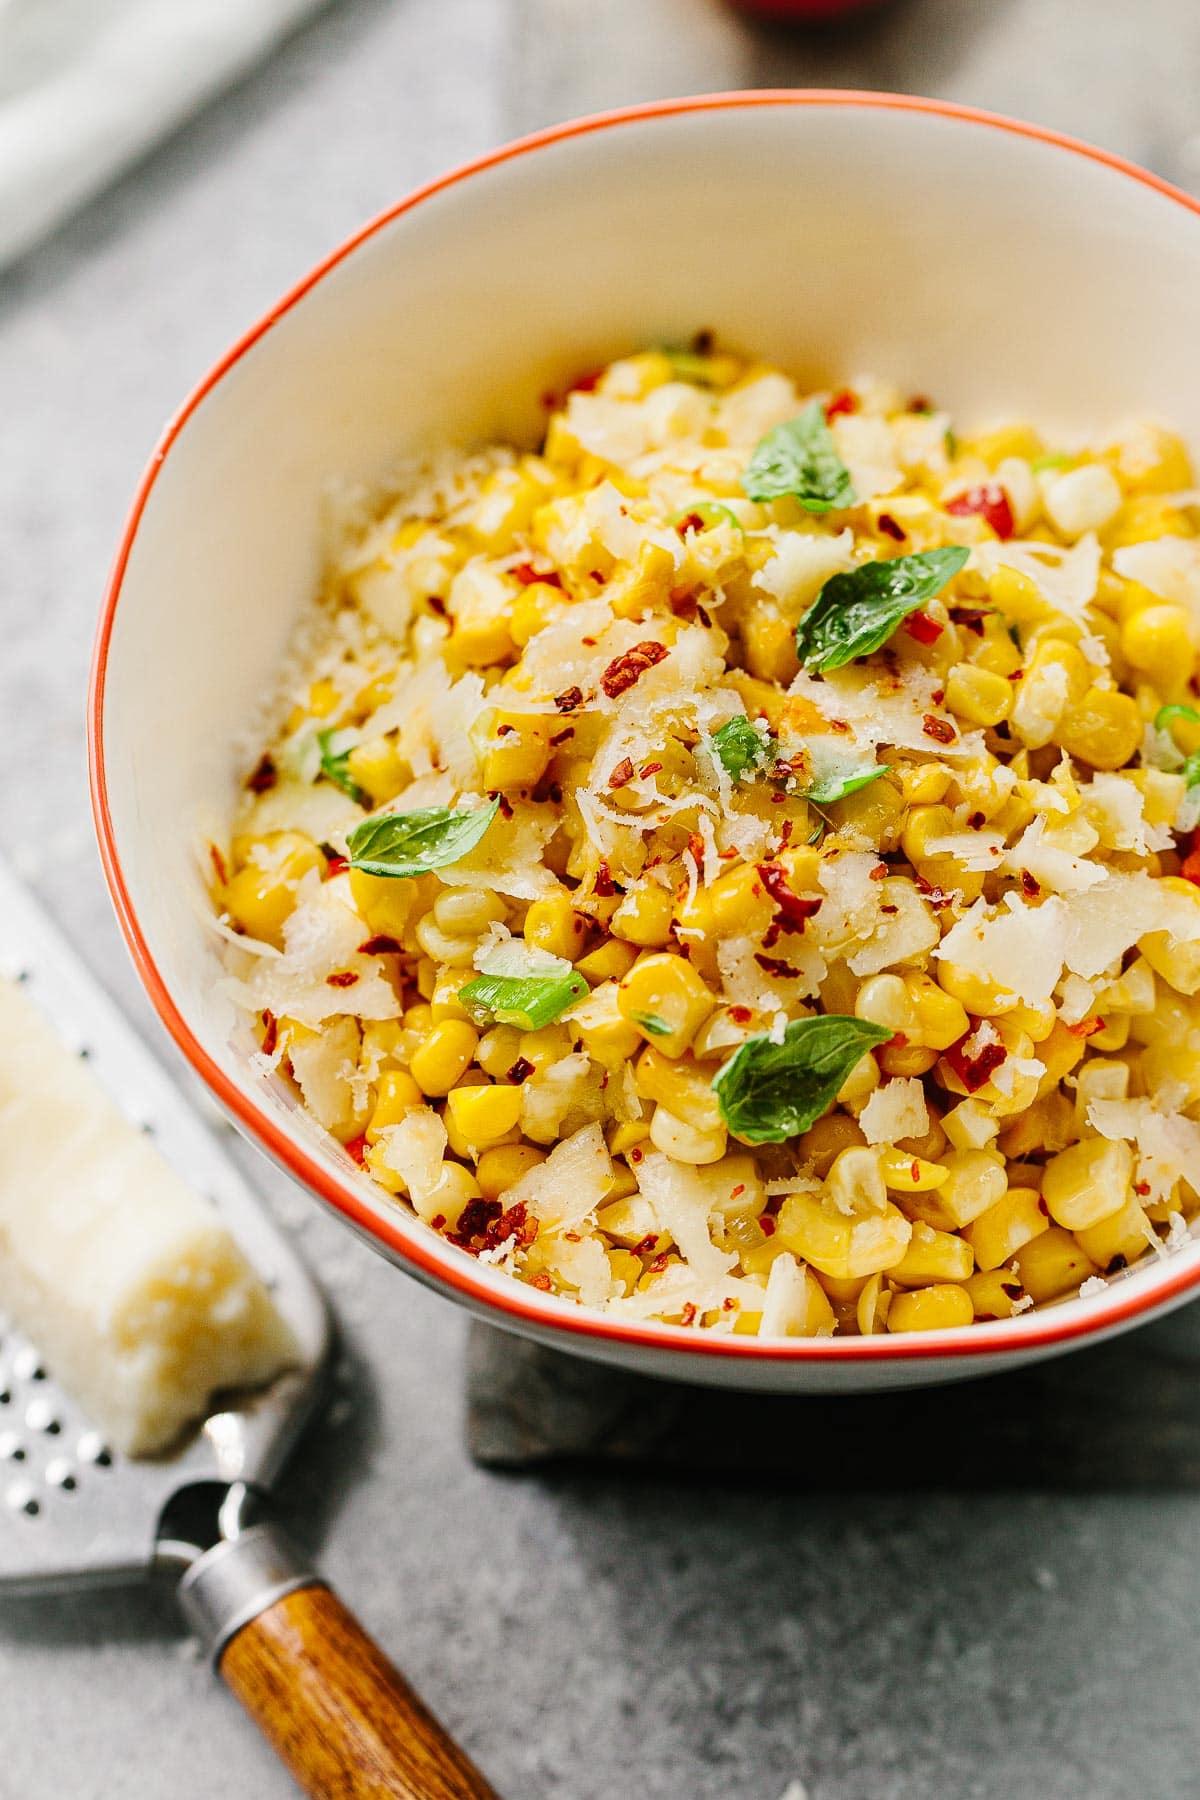 Sweet Corn Salad with Pecorino Cheese